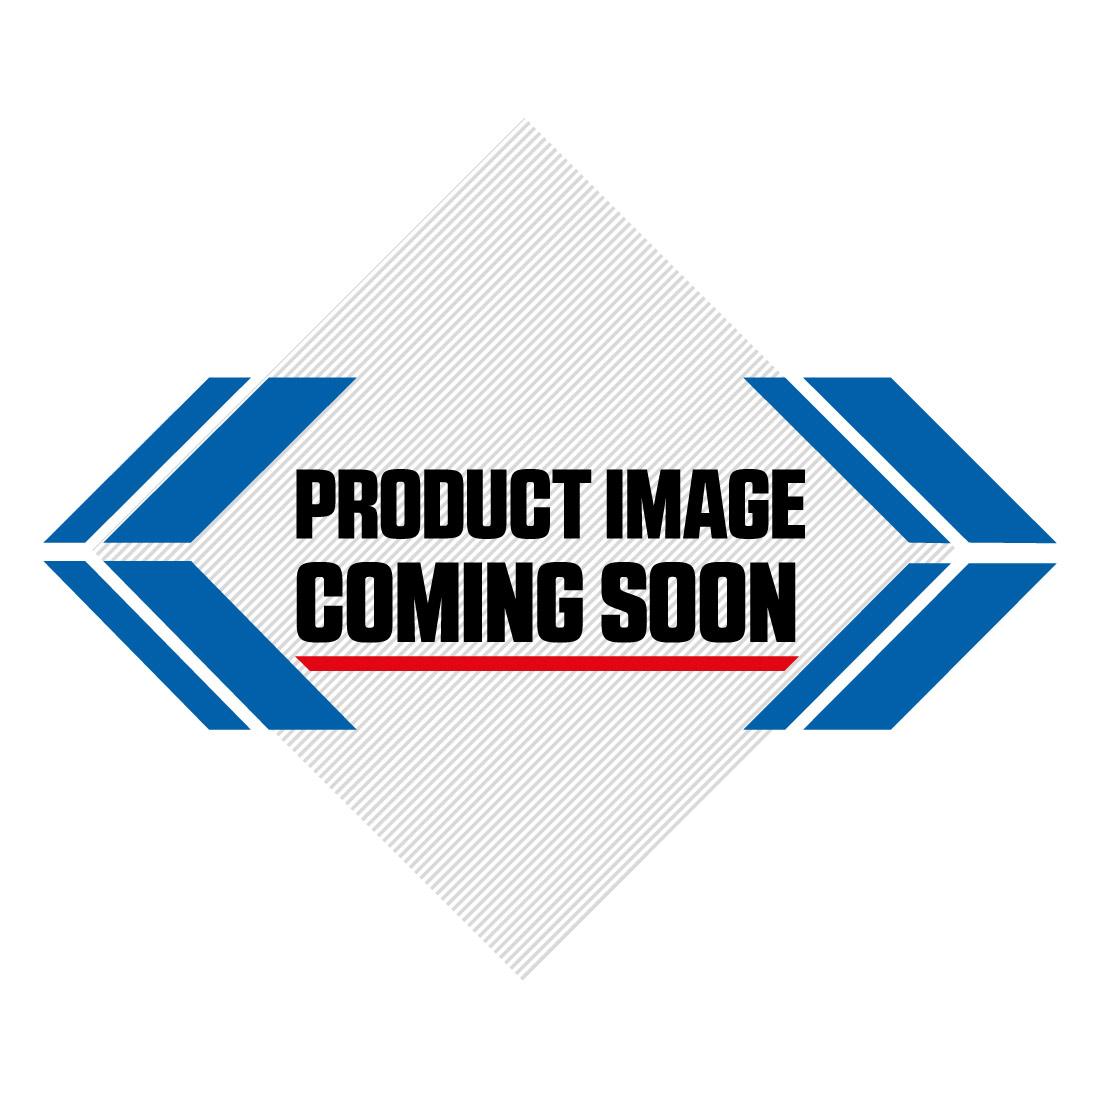 Renthal Twinring Rear Sprocket KTM SX SX-F EXC EXC-F Husqvarna TC FC TE FE - Black Image-1